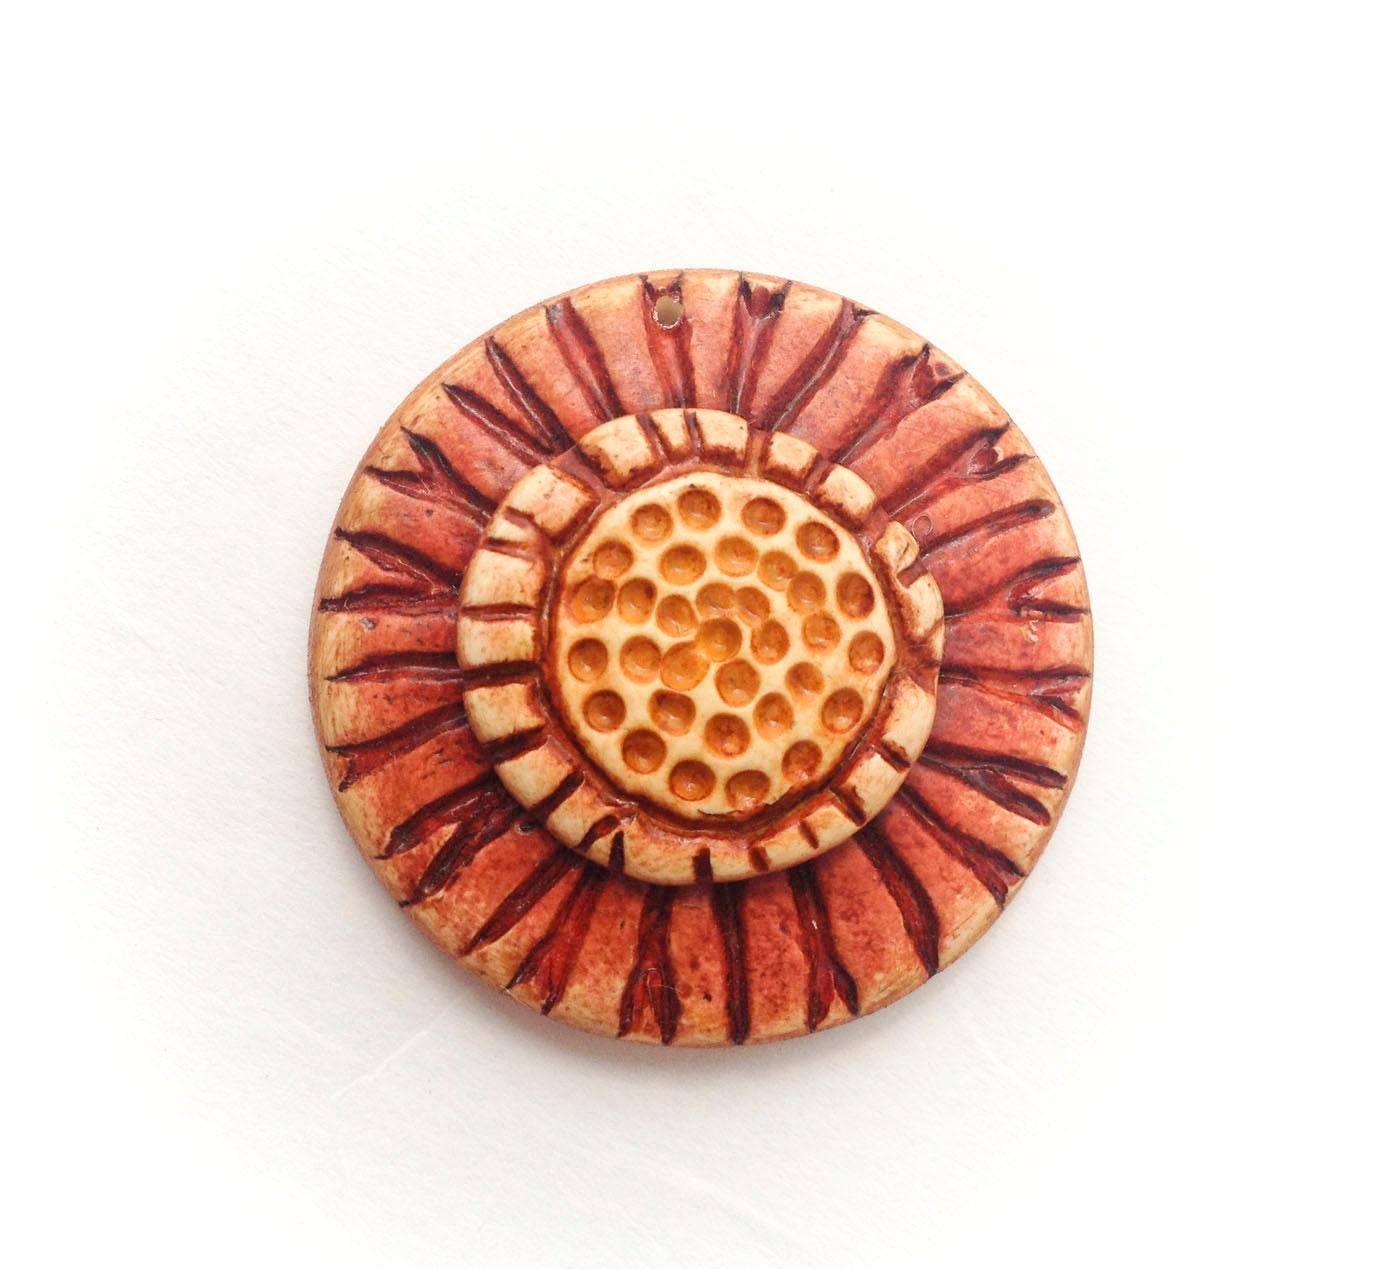 Boho Sunburst Blossom Polymer Clay Pendant - Distlefunk2